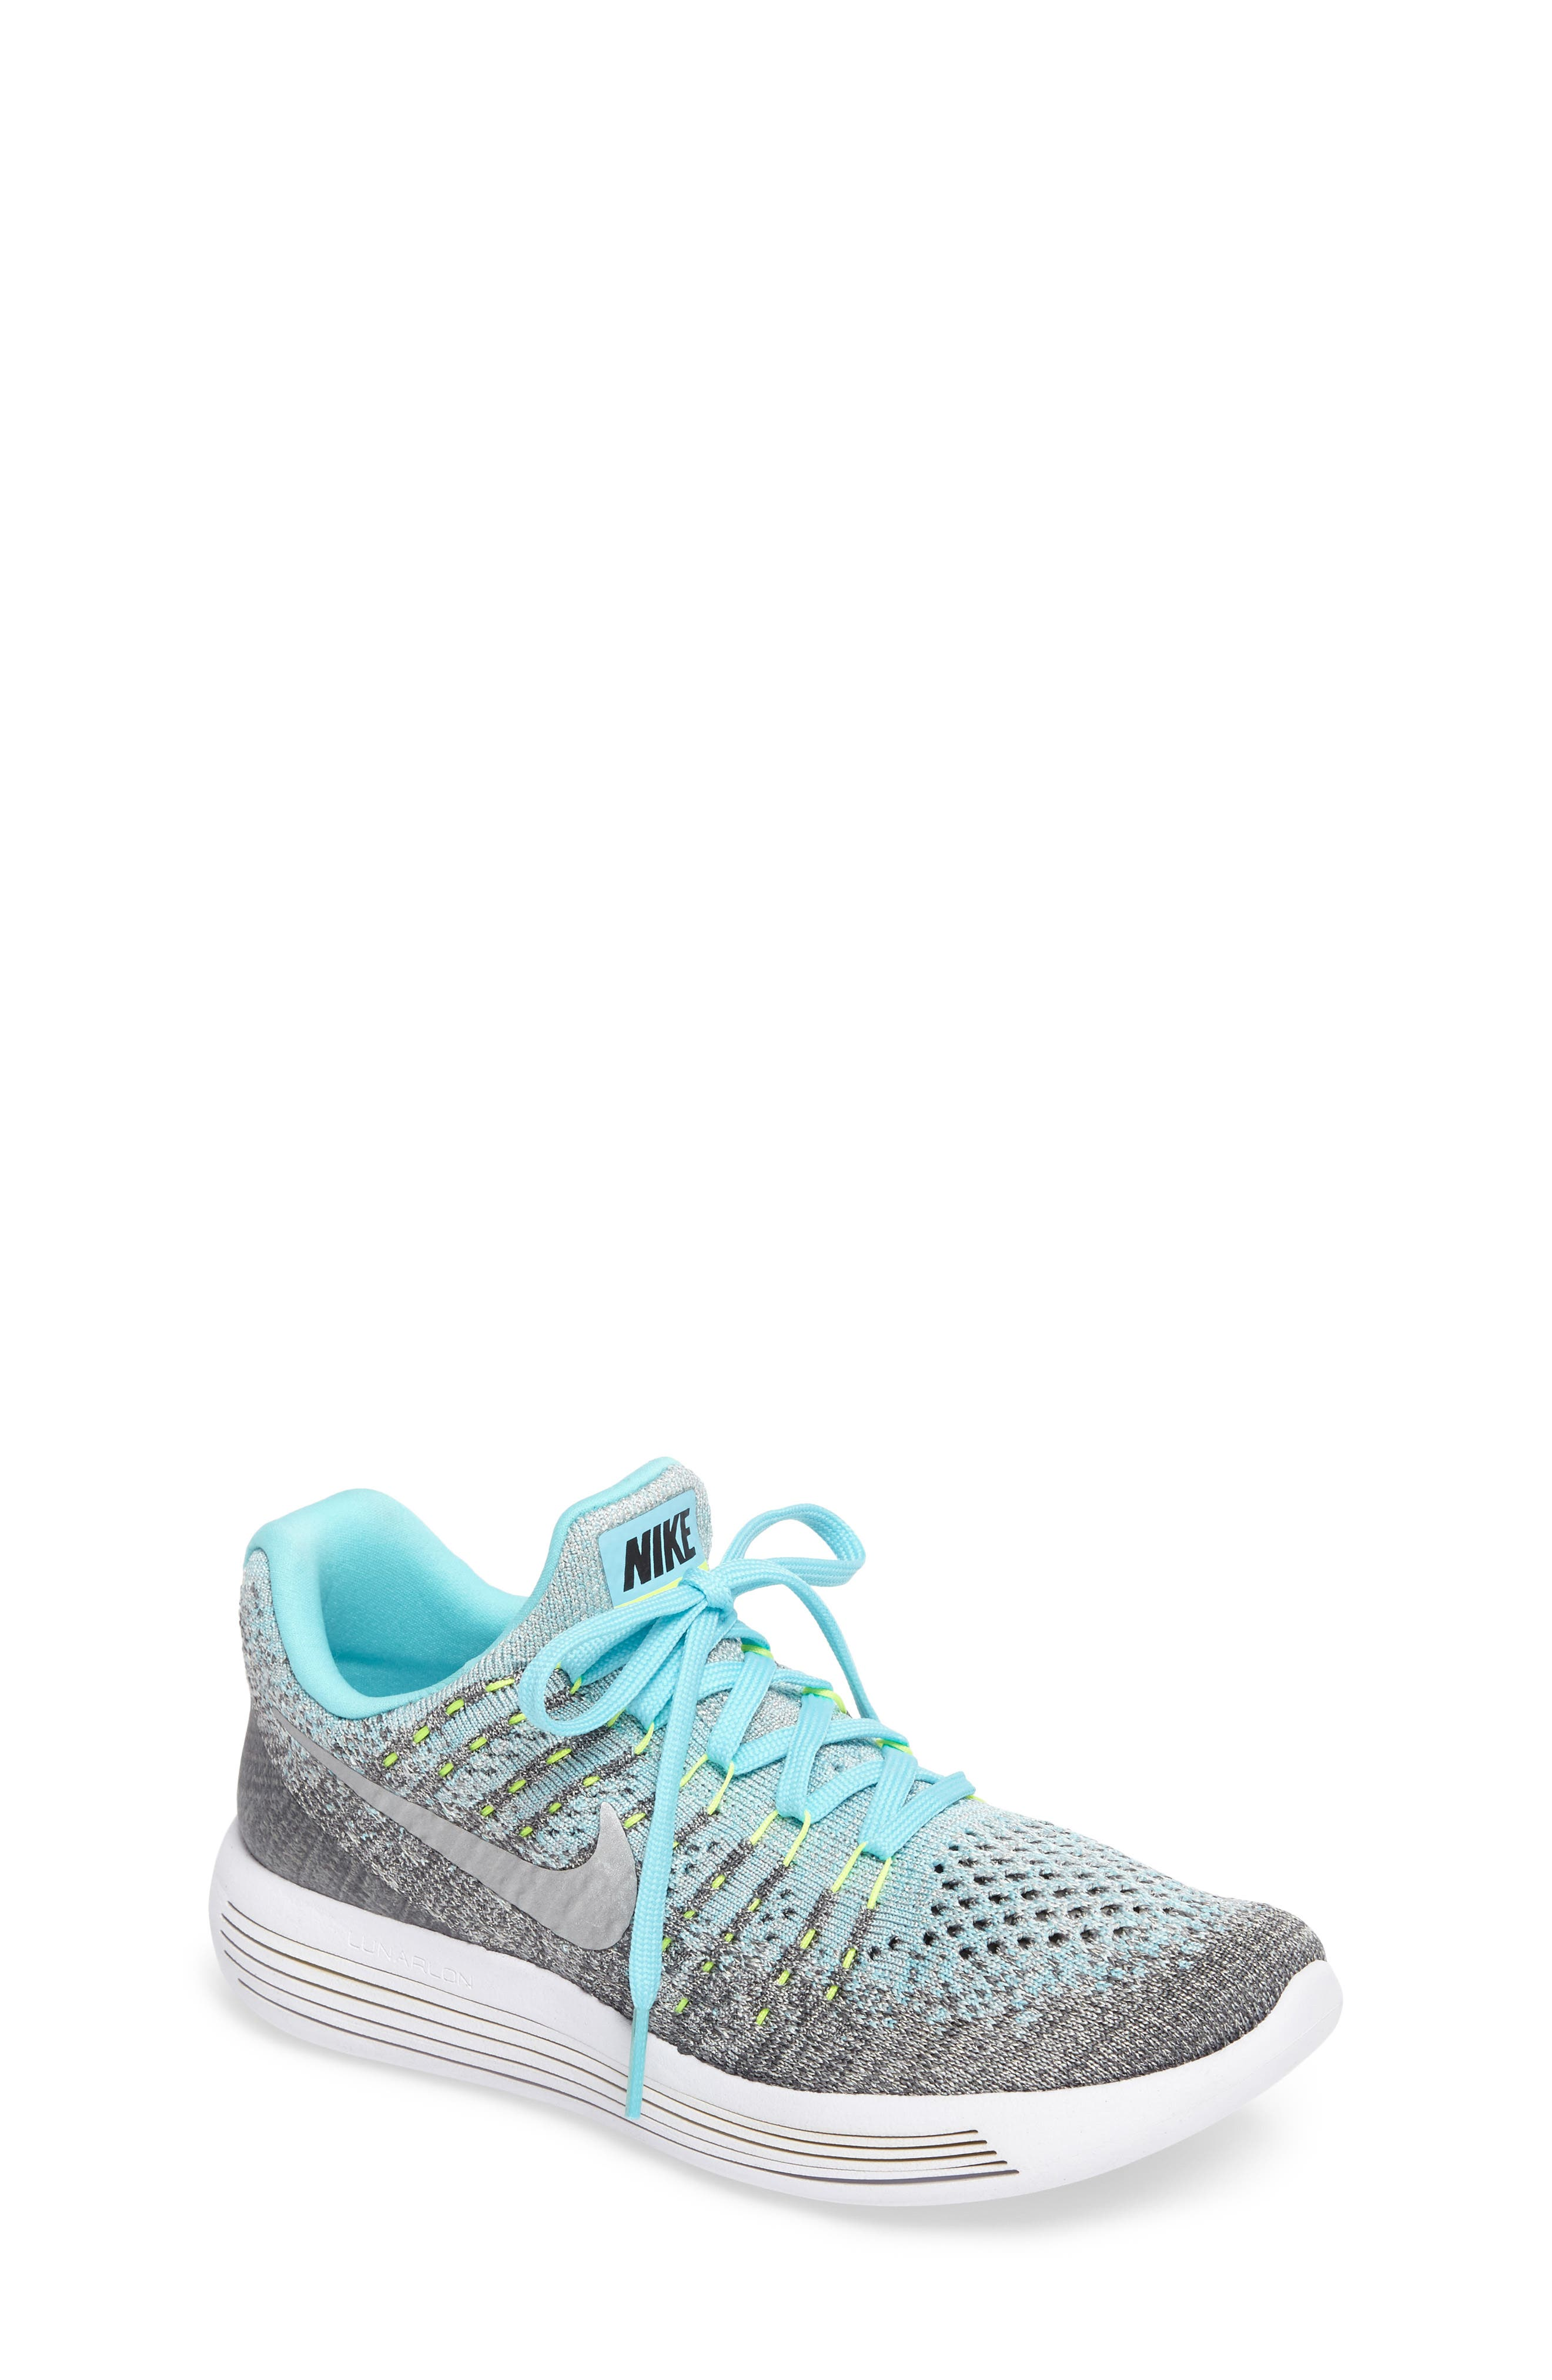 Flyknit LunarEpic Sneaker,                         Main,                         color, Grey/ Metallic Silver/ Blue